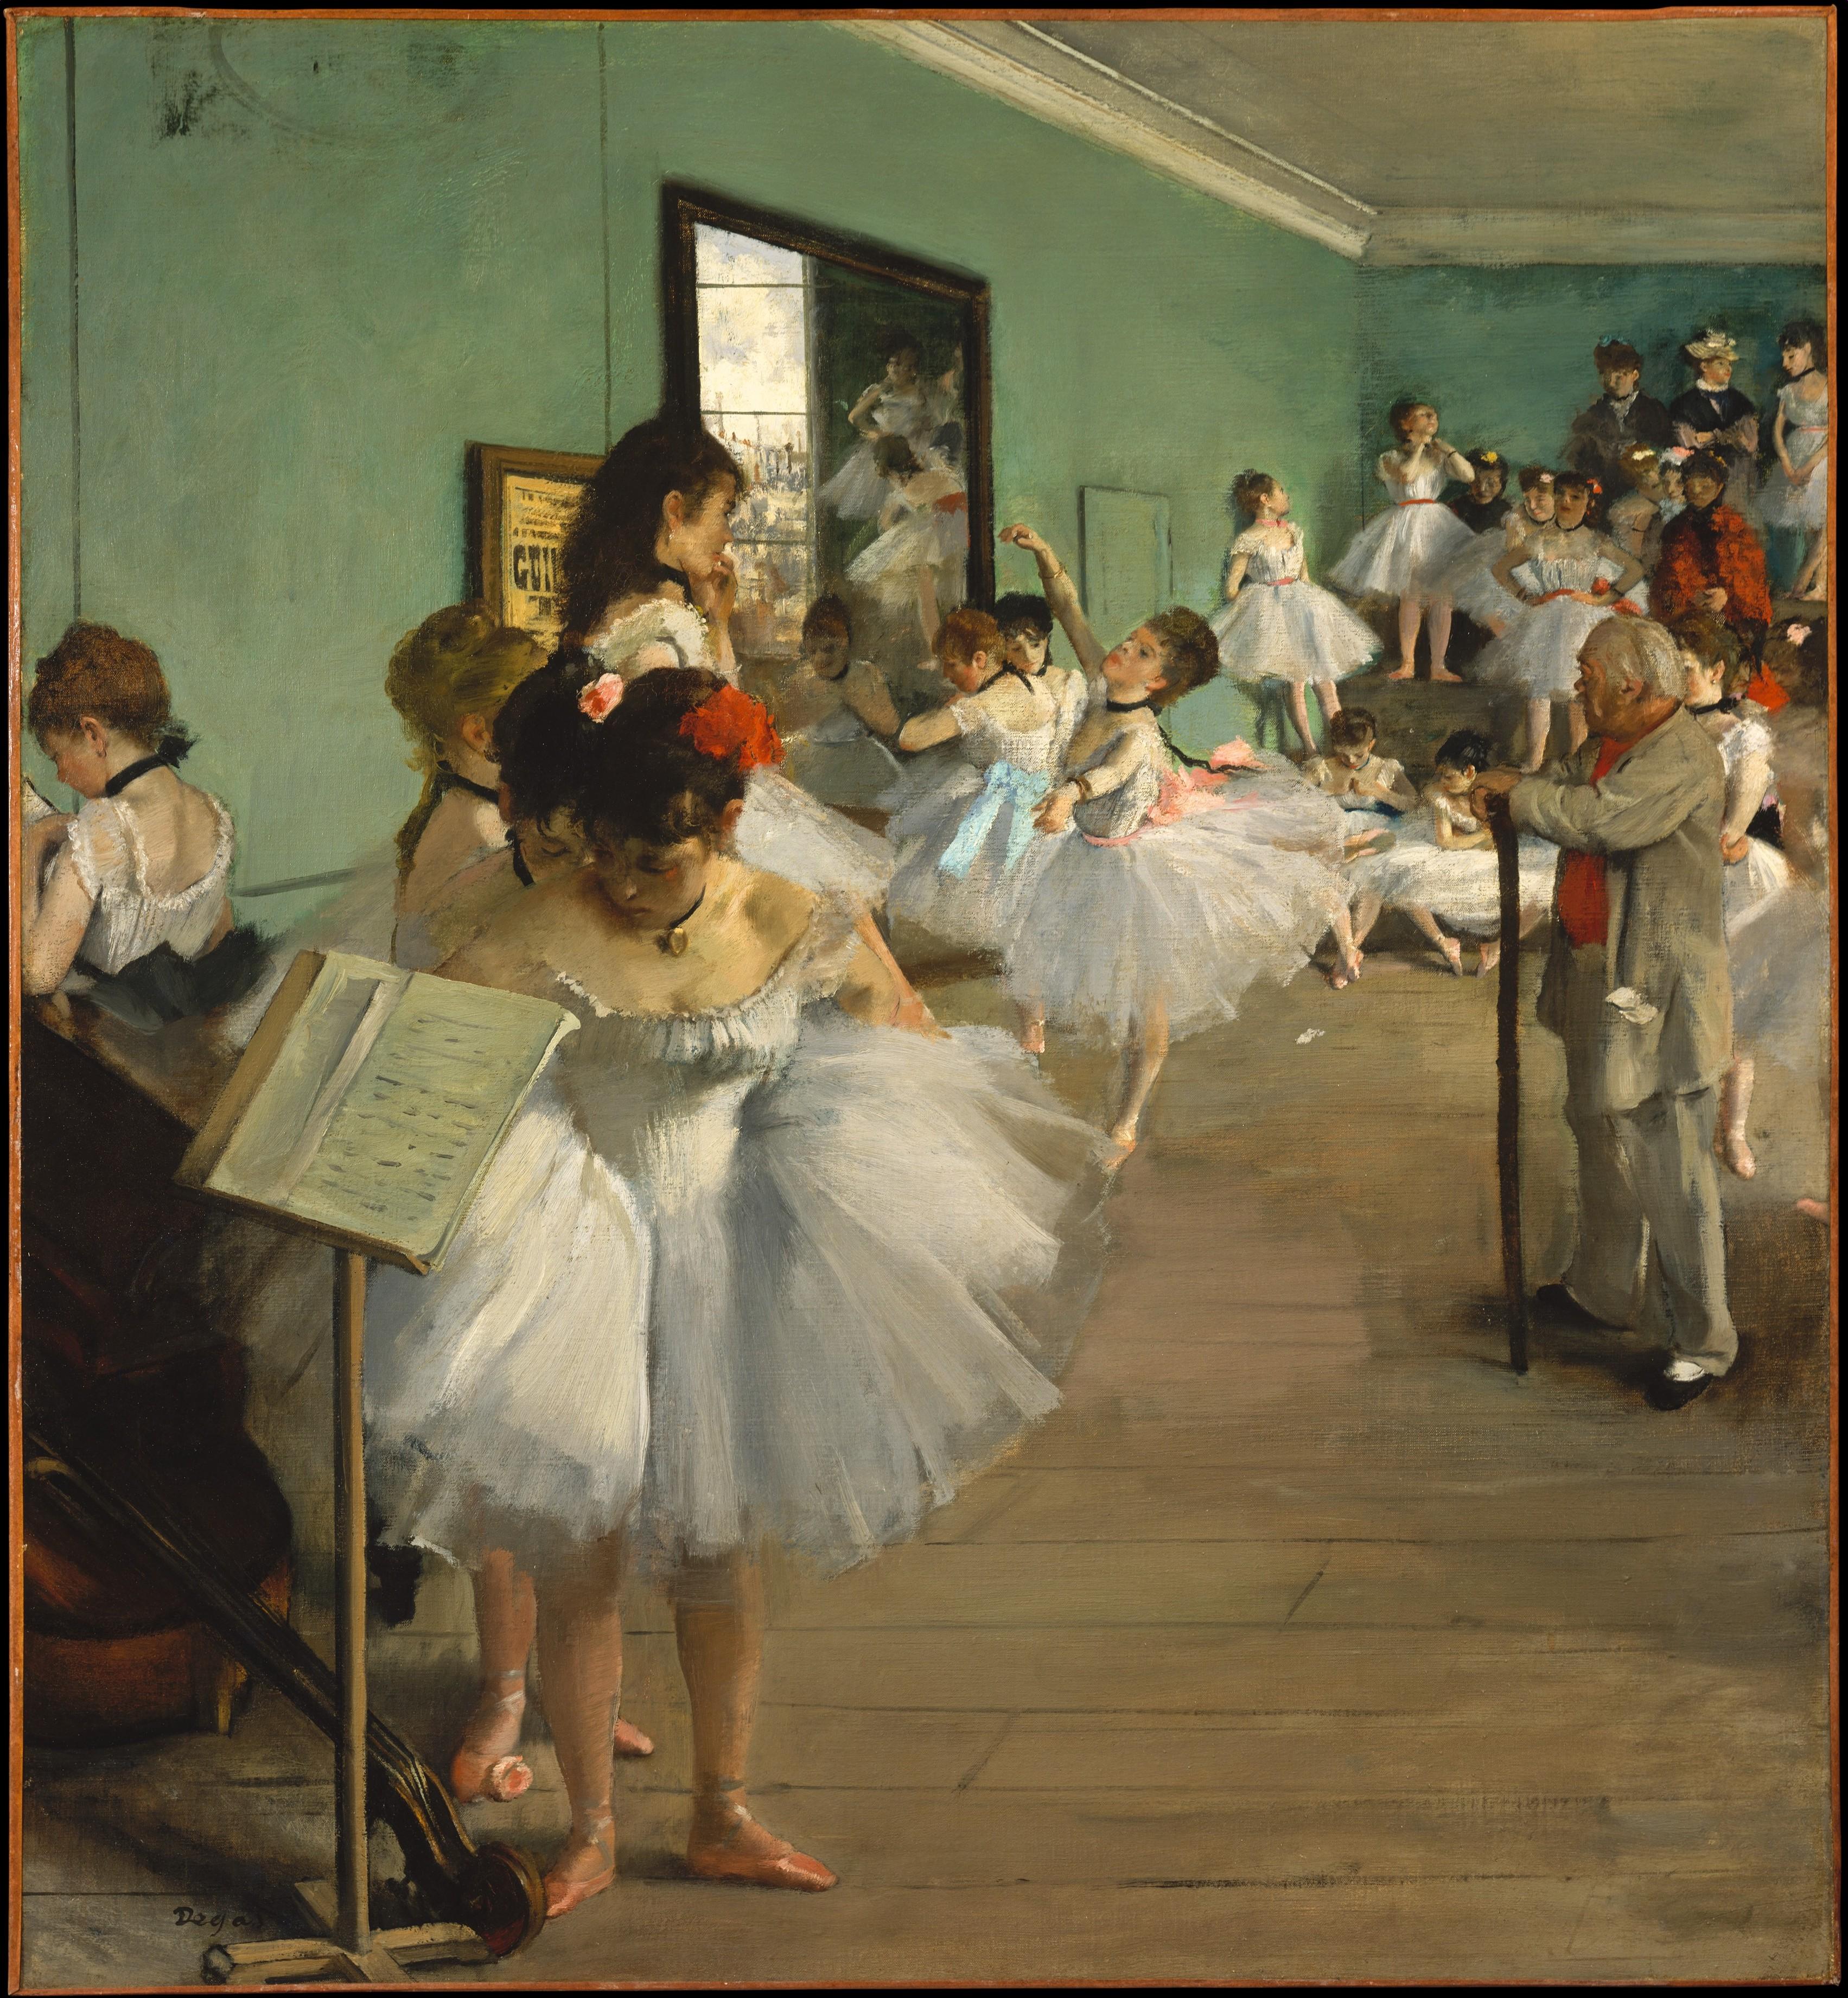 File:Edgar Degas The Dance Class.jpg - Wikimedia Commons